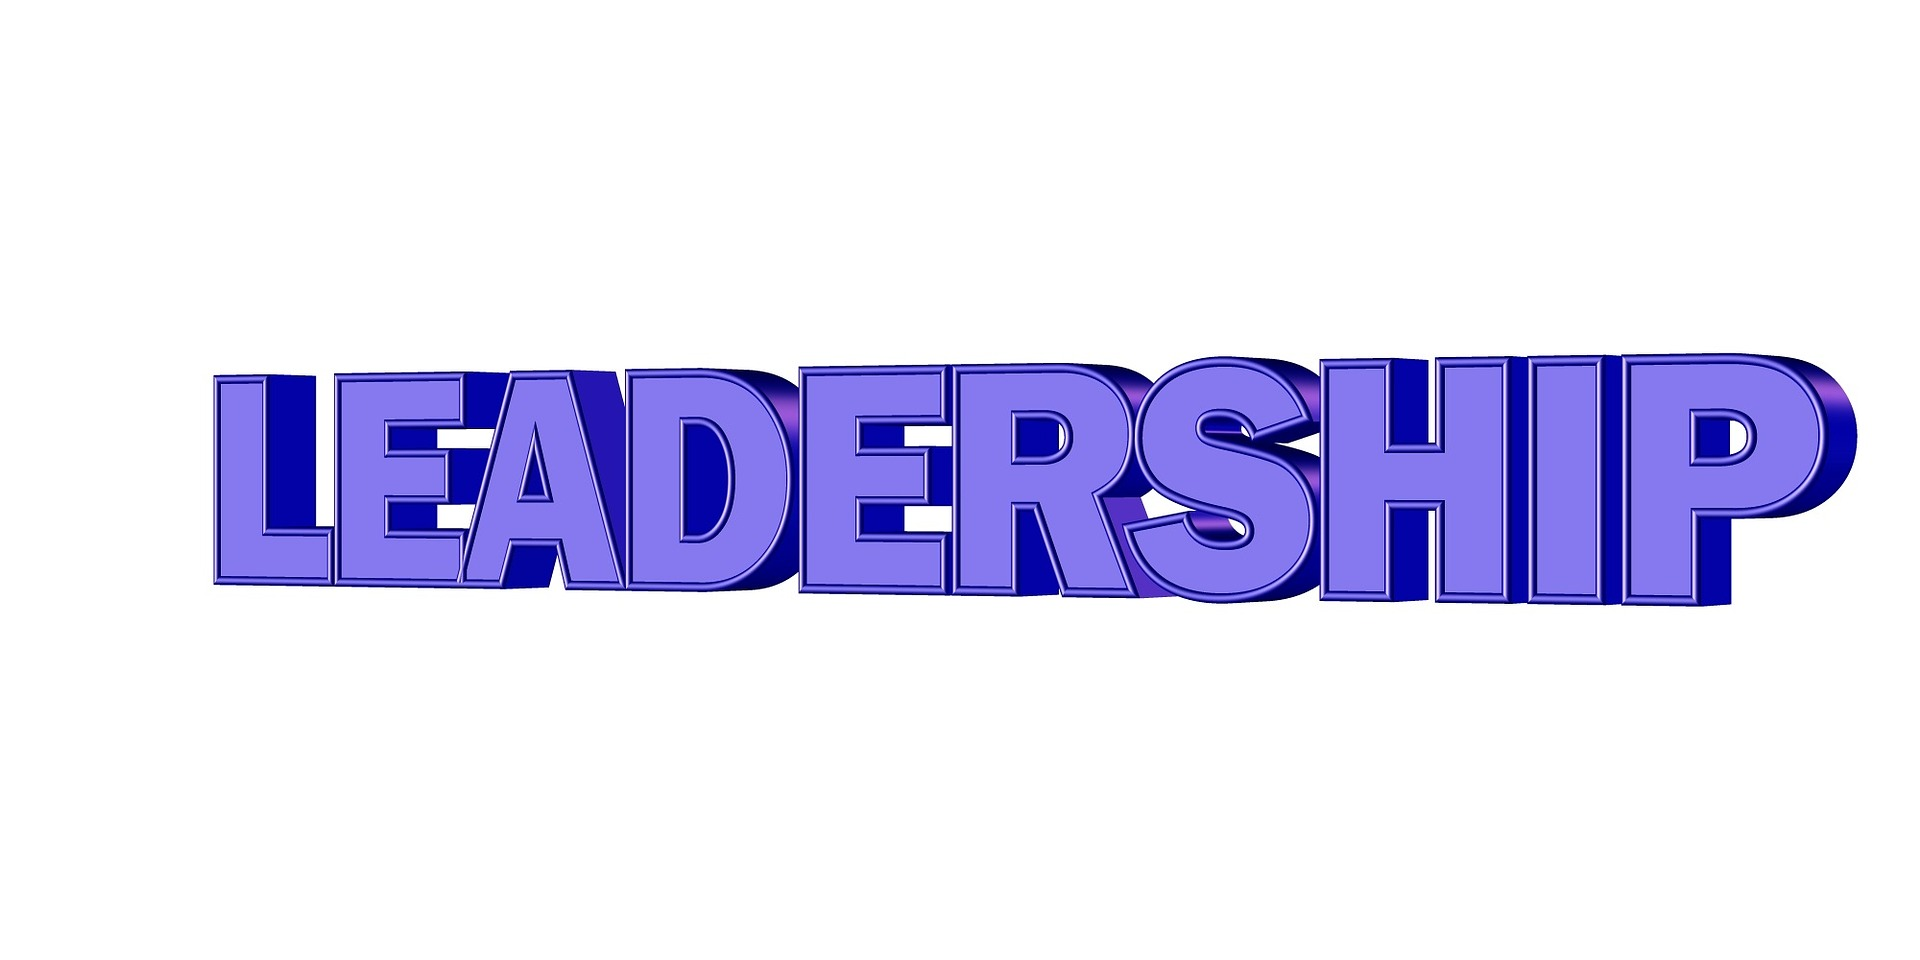 leadership 709665 1920 15. Juni 2021